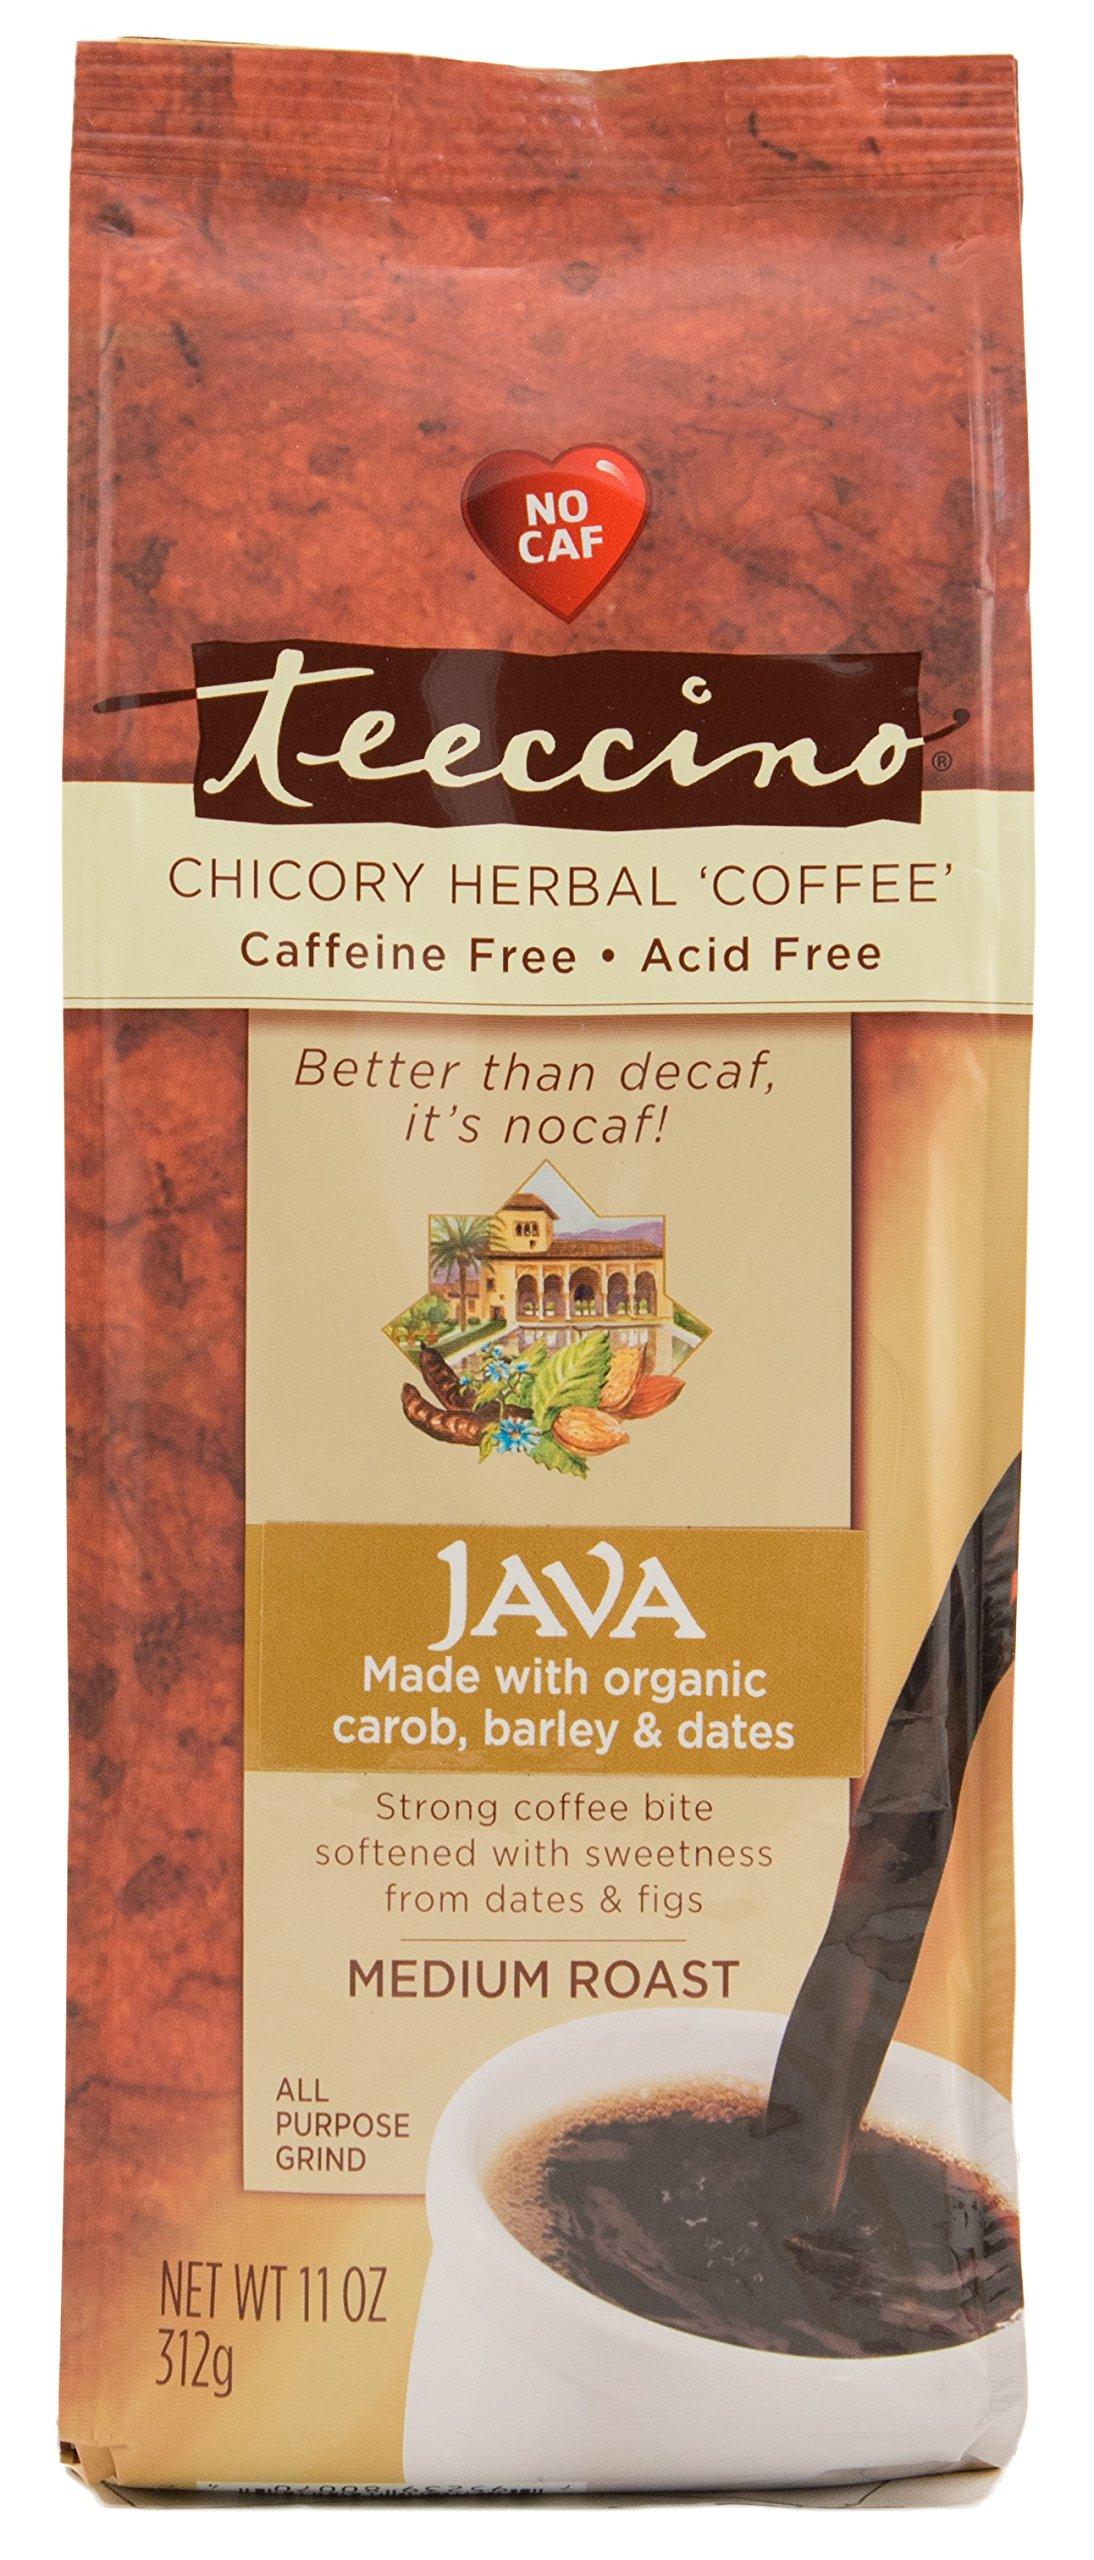 Teeccino Java Chicory Herbal Coffee Alternative, Caffeine Free, Acid Free  11 Ounce (Pack of 3)